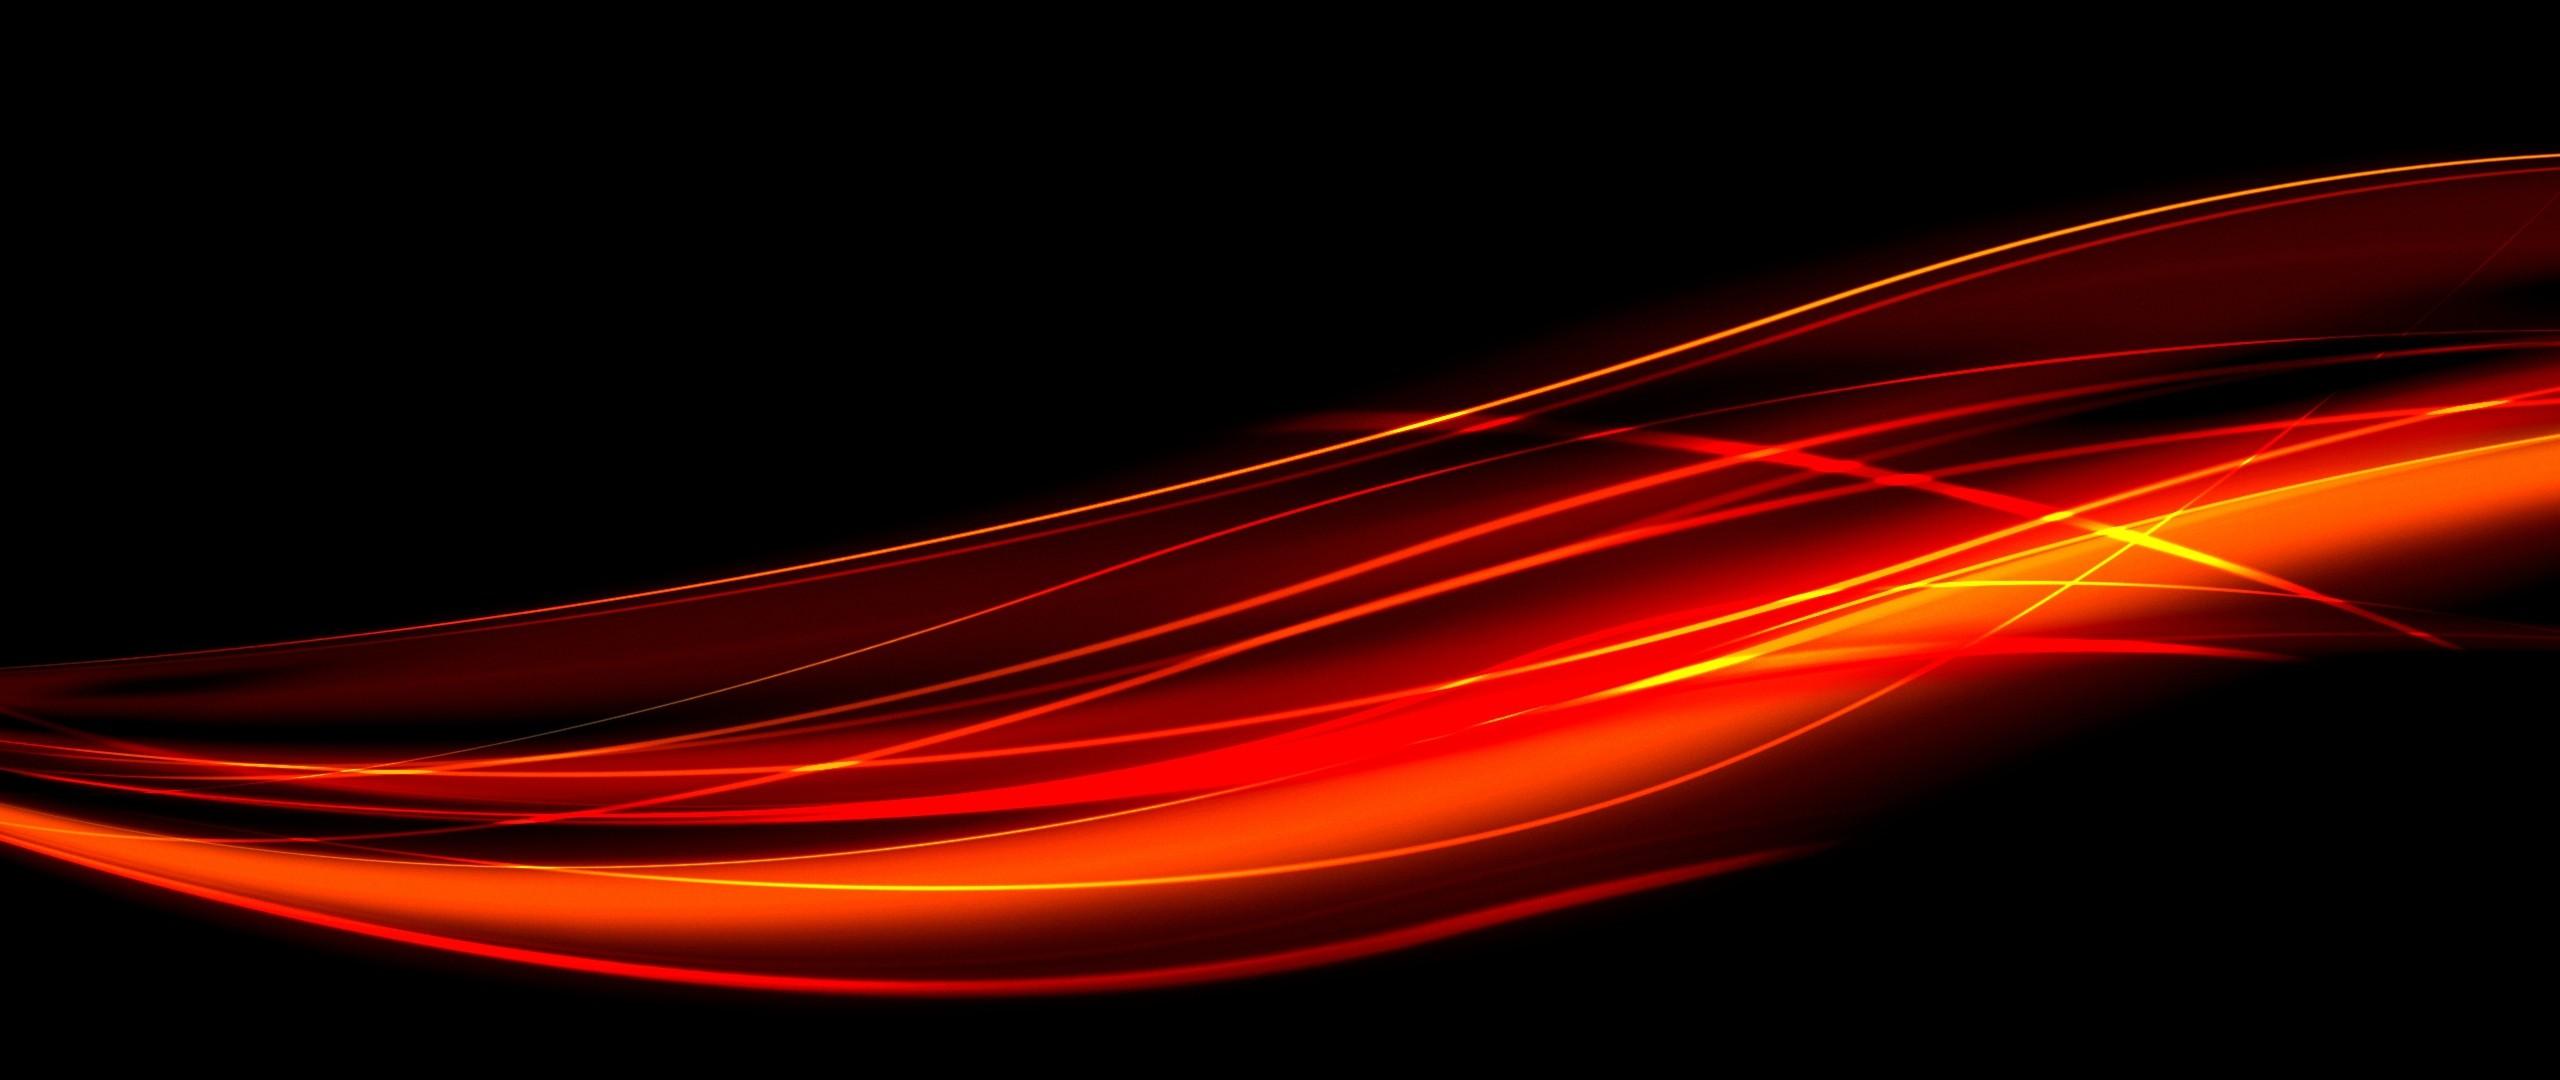 Preview wallpaper black, red, line, light 2560×1080